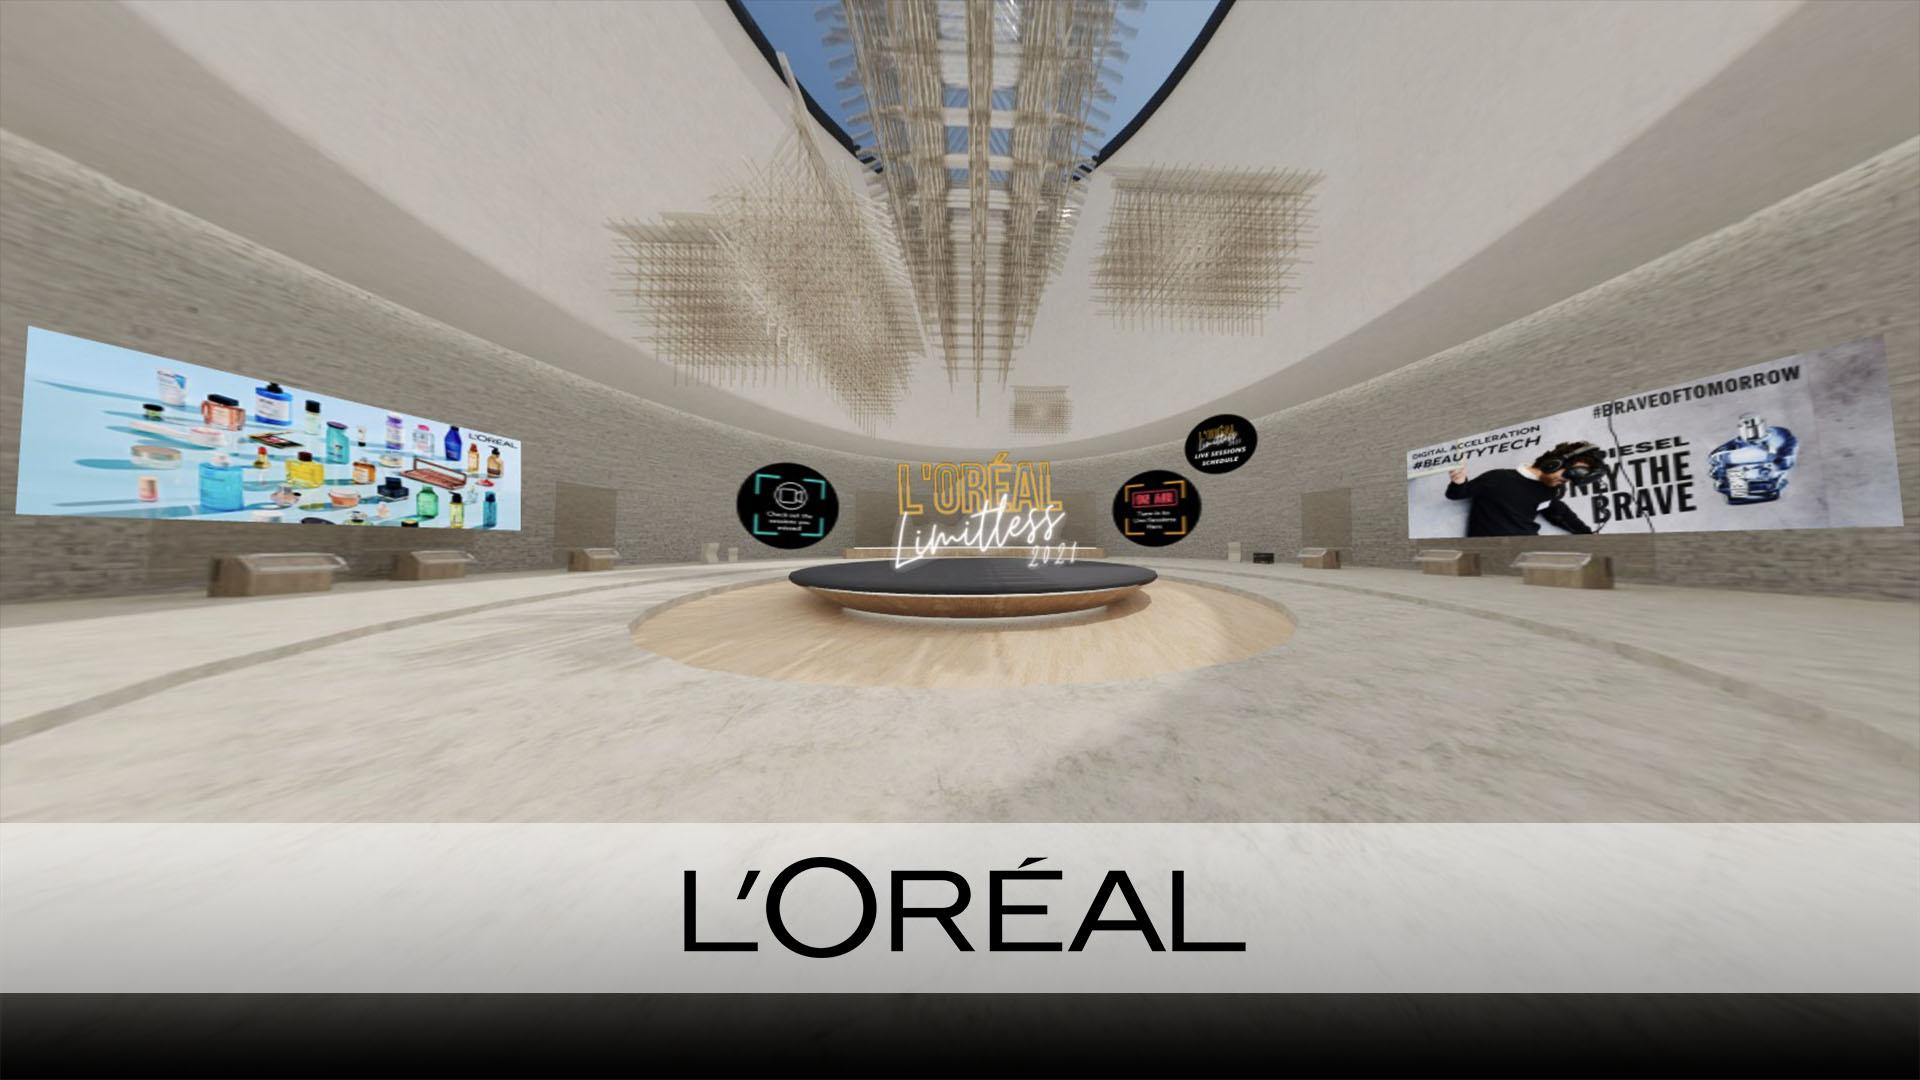 LOREAL Virtual Career Fair